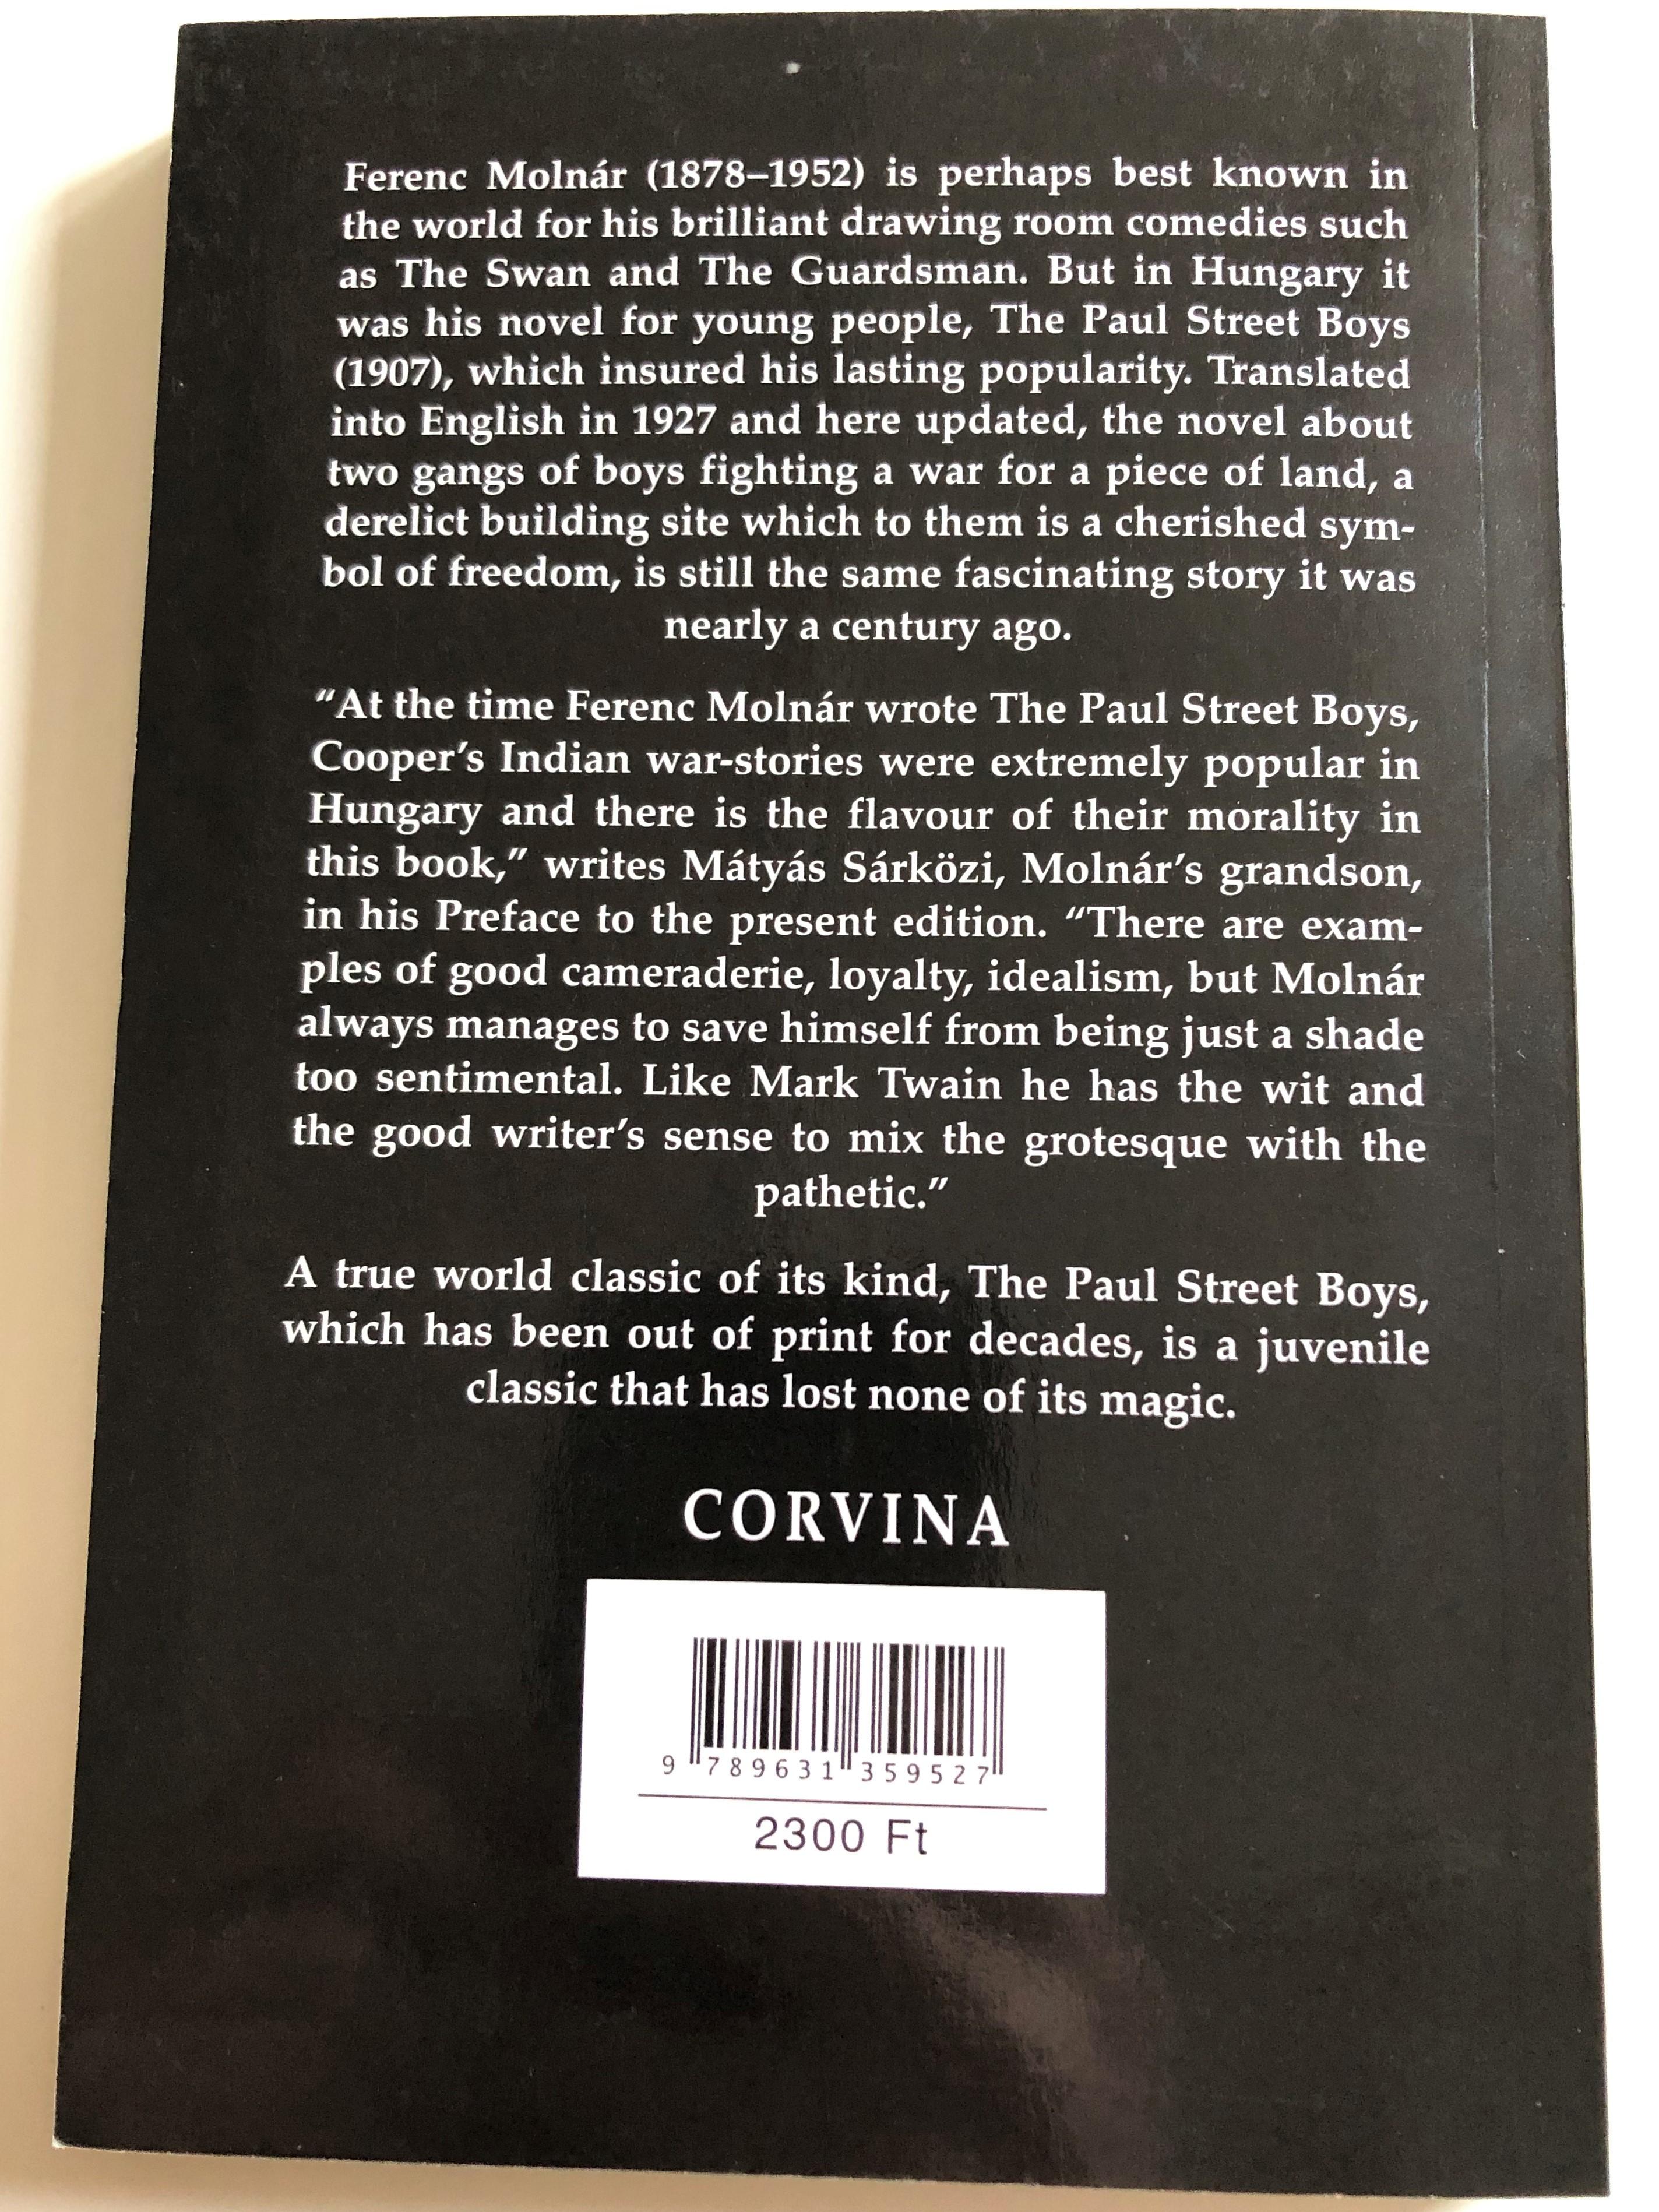 the-paul-street-boys-ferenc-moln-r-p-l-utcai-fi-k-in-english-language-paperback-corvina-2015-hungarian-literary-classic-2-.jpg